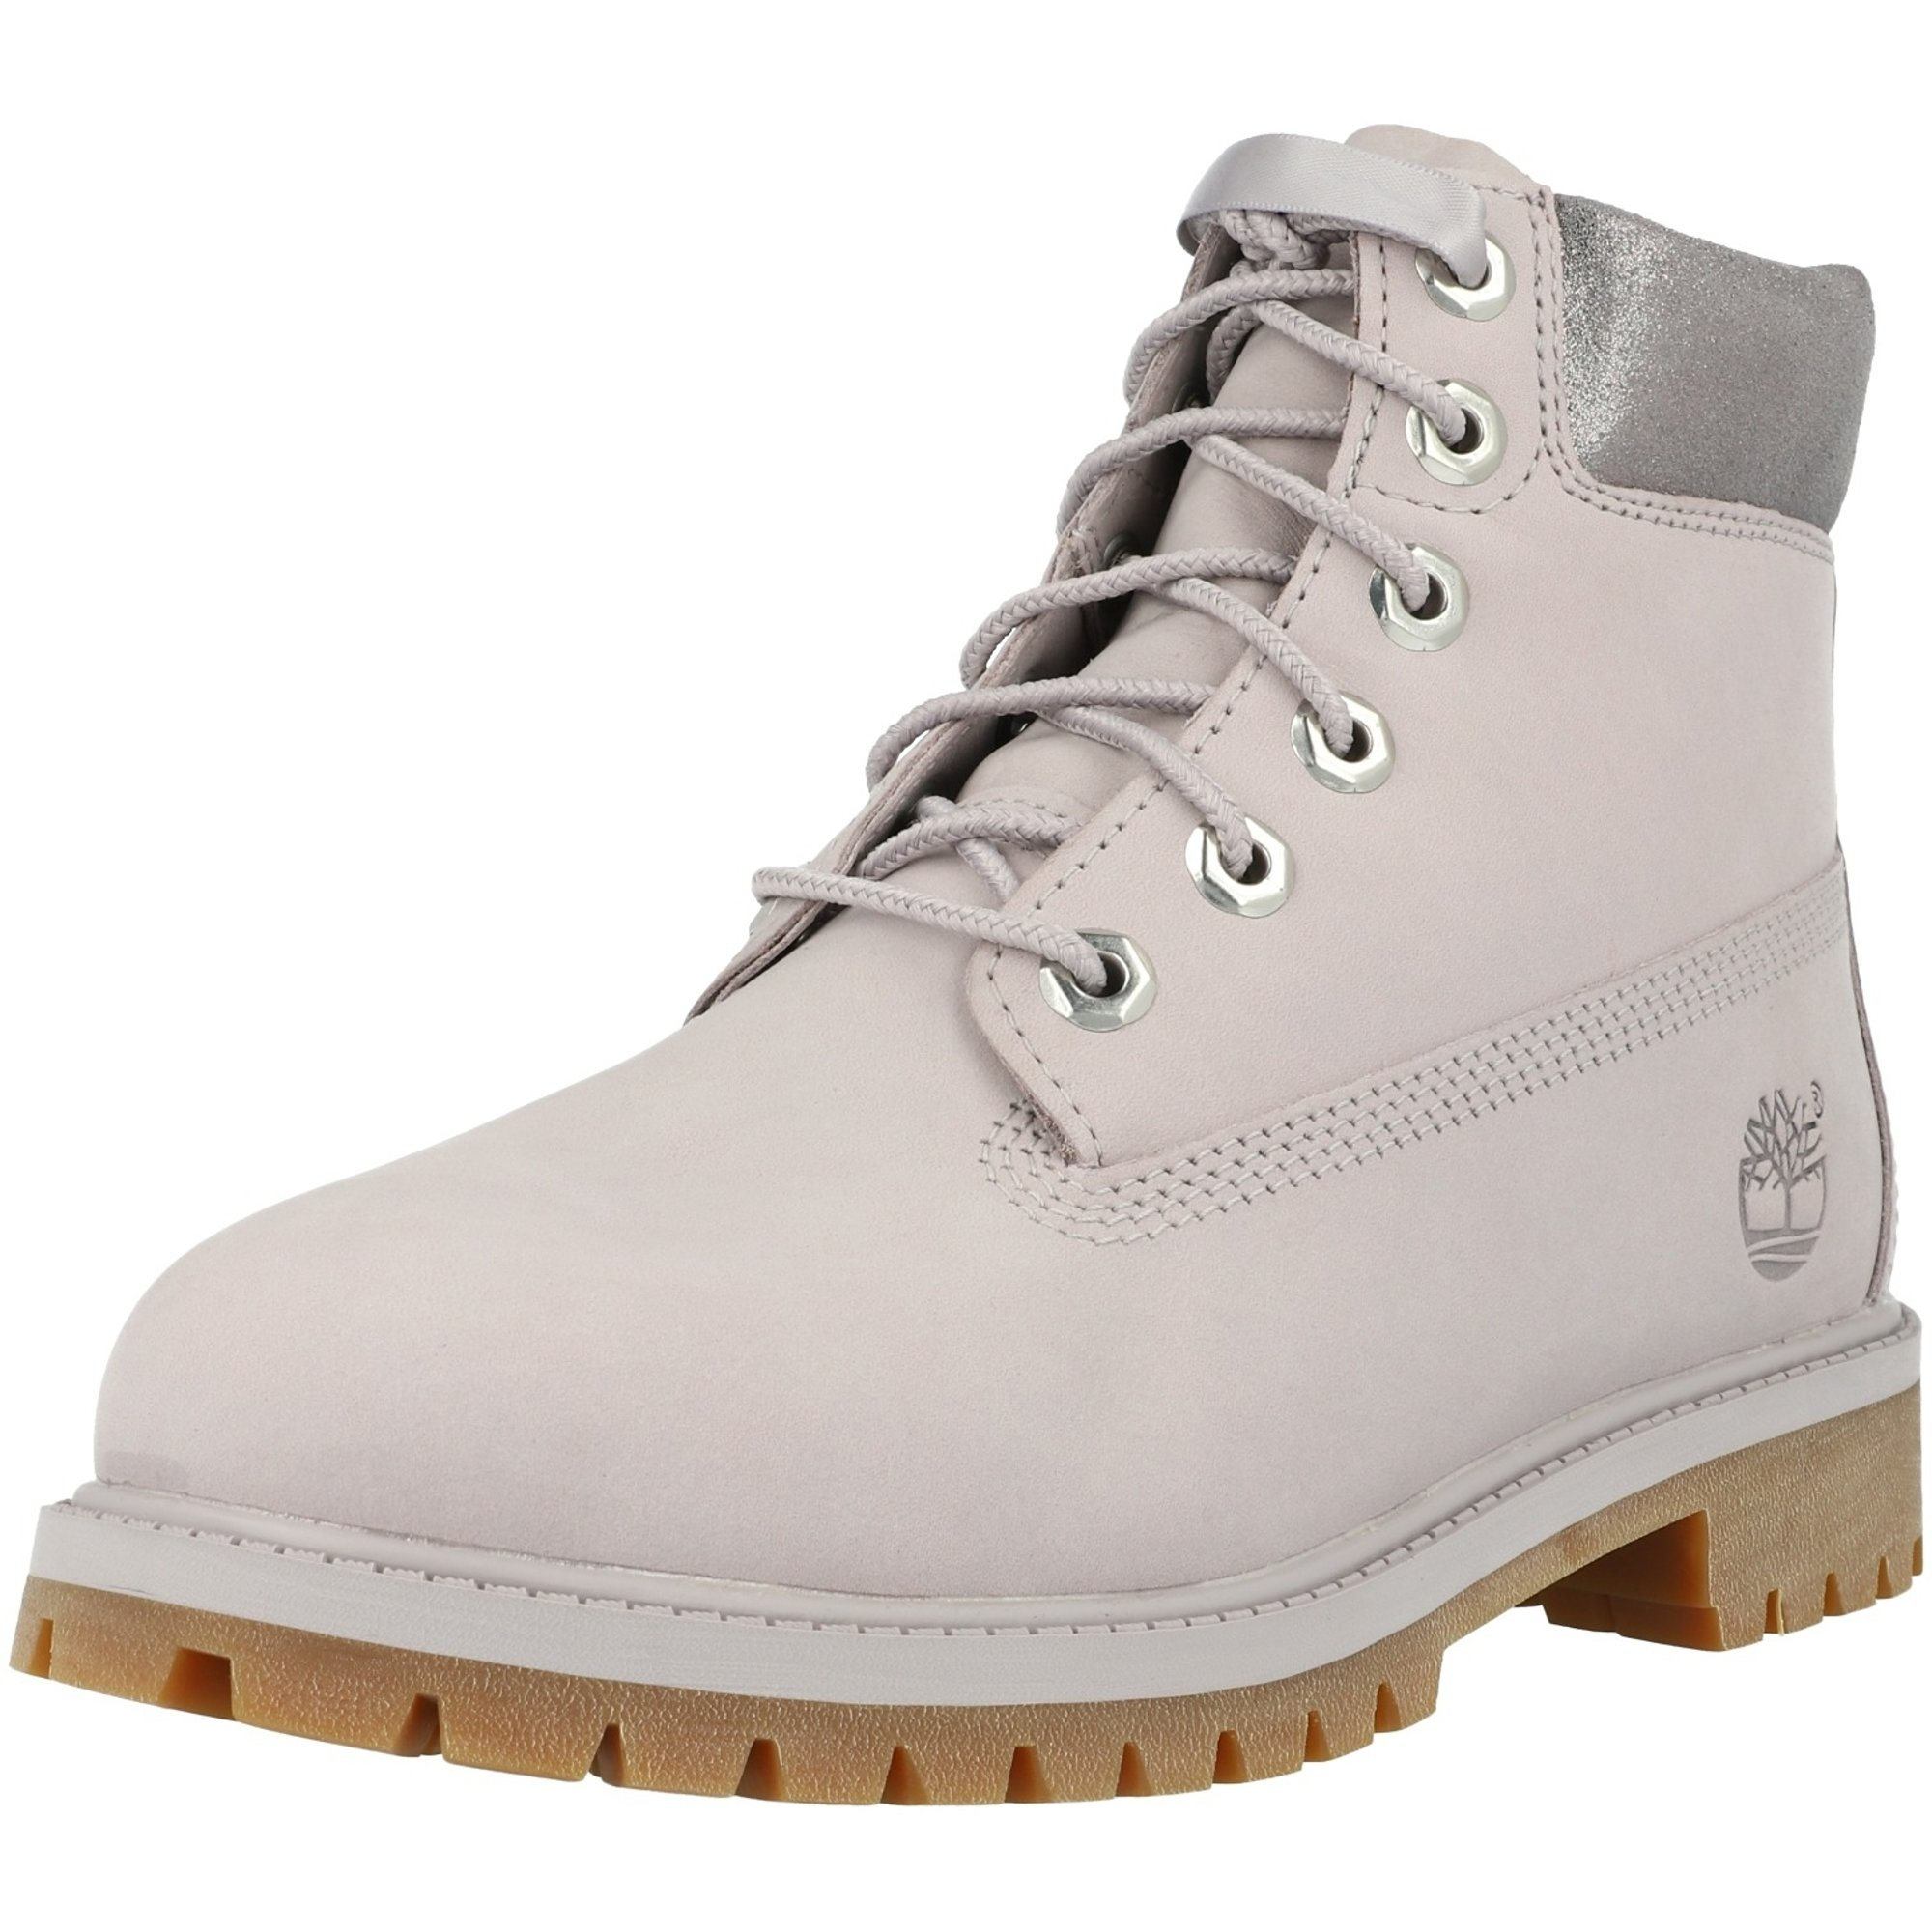 Desaparecido juego Asia  Timberland 6 Inch Premium Waterproof J Gris (Light Grey) Nobuck - Tobillo  Botas - Awesome Shoes